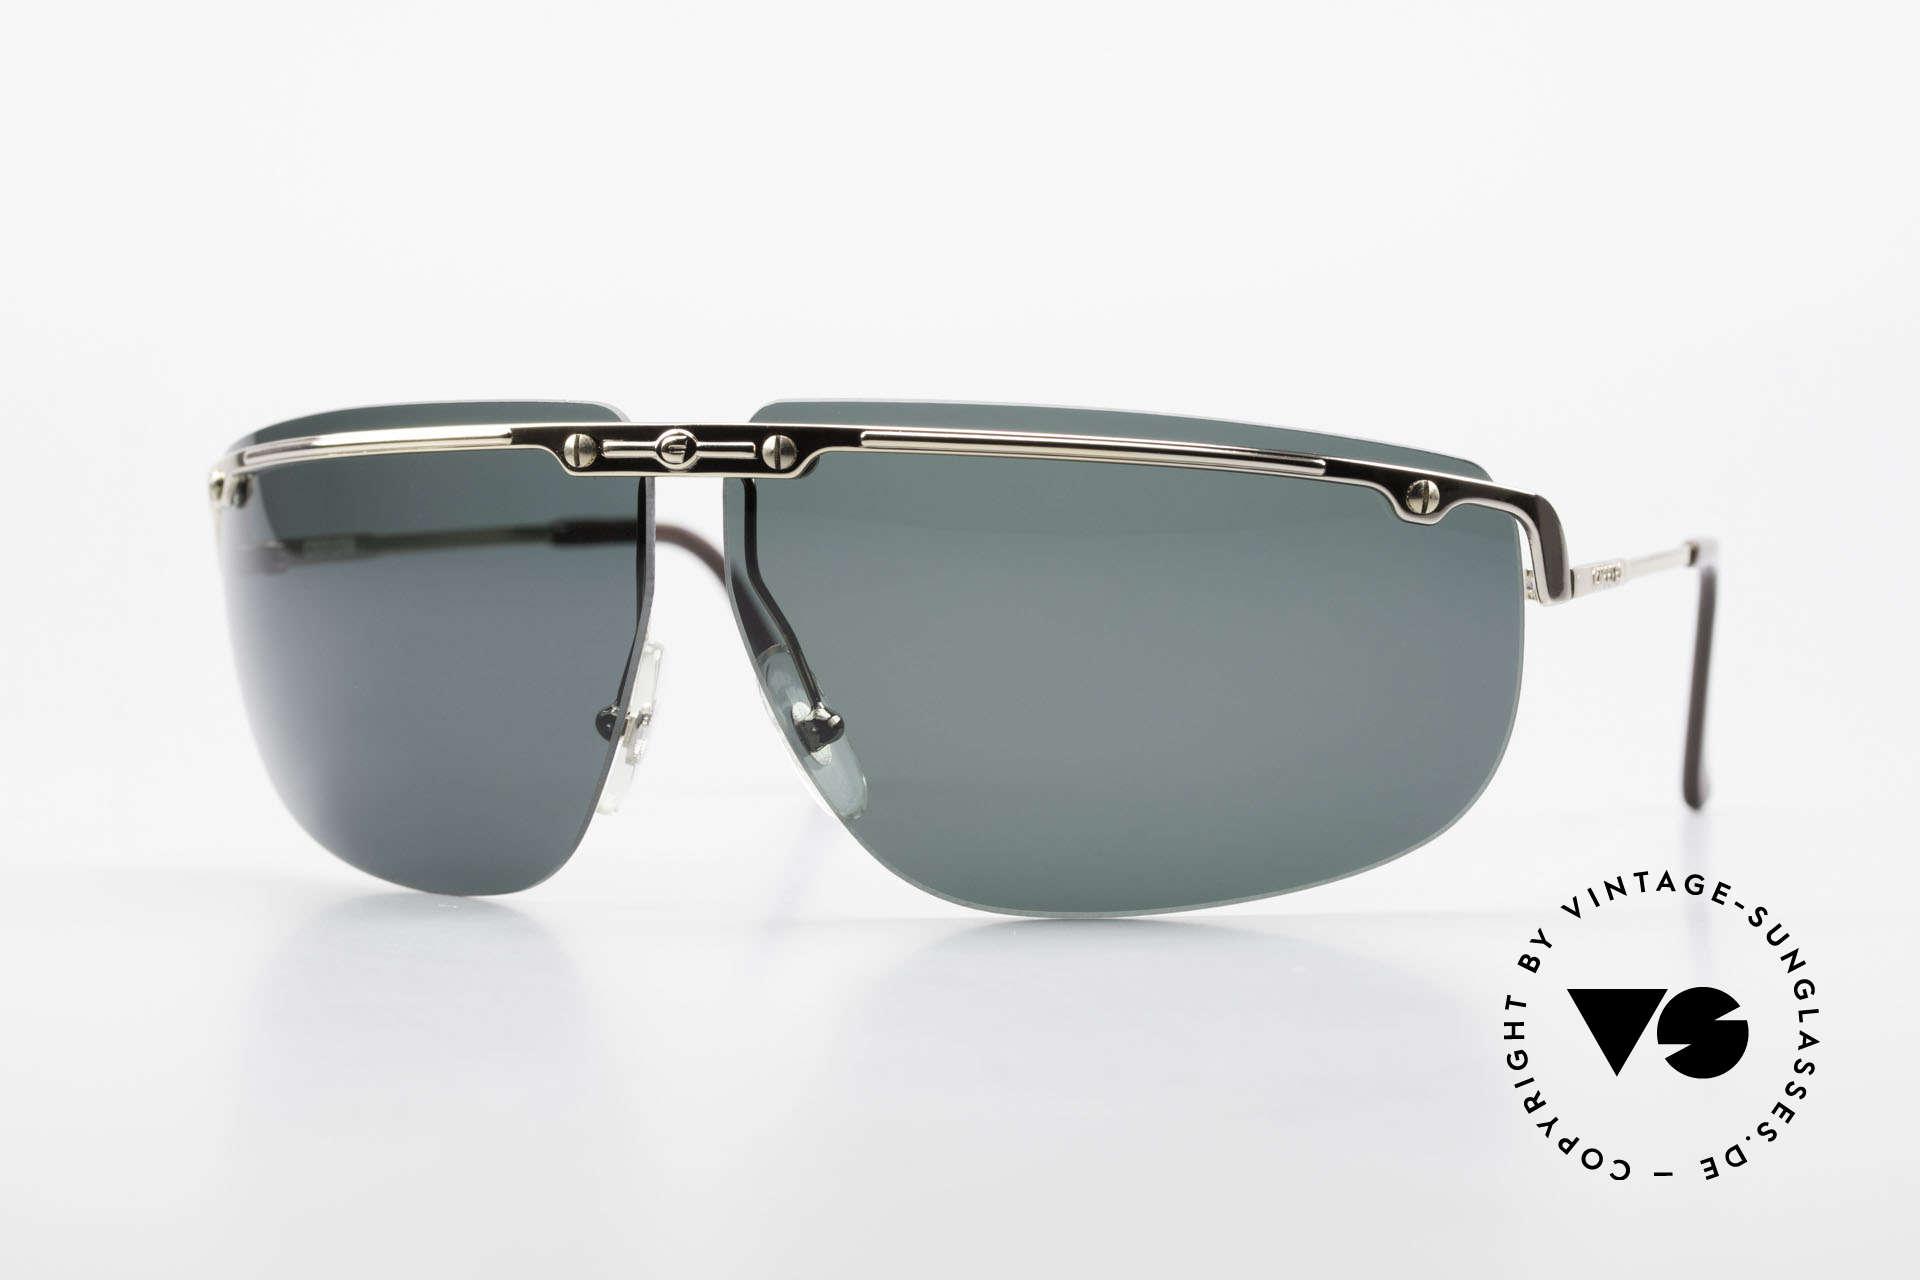 Carrera 5420 90's Wrap Sports Sunglasses, wrap around Carrera sports sunglasses from 1990, Made for Men